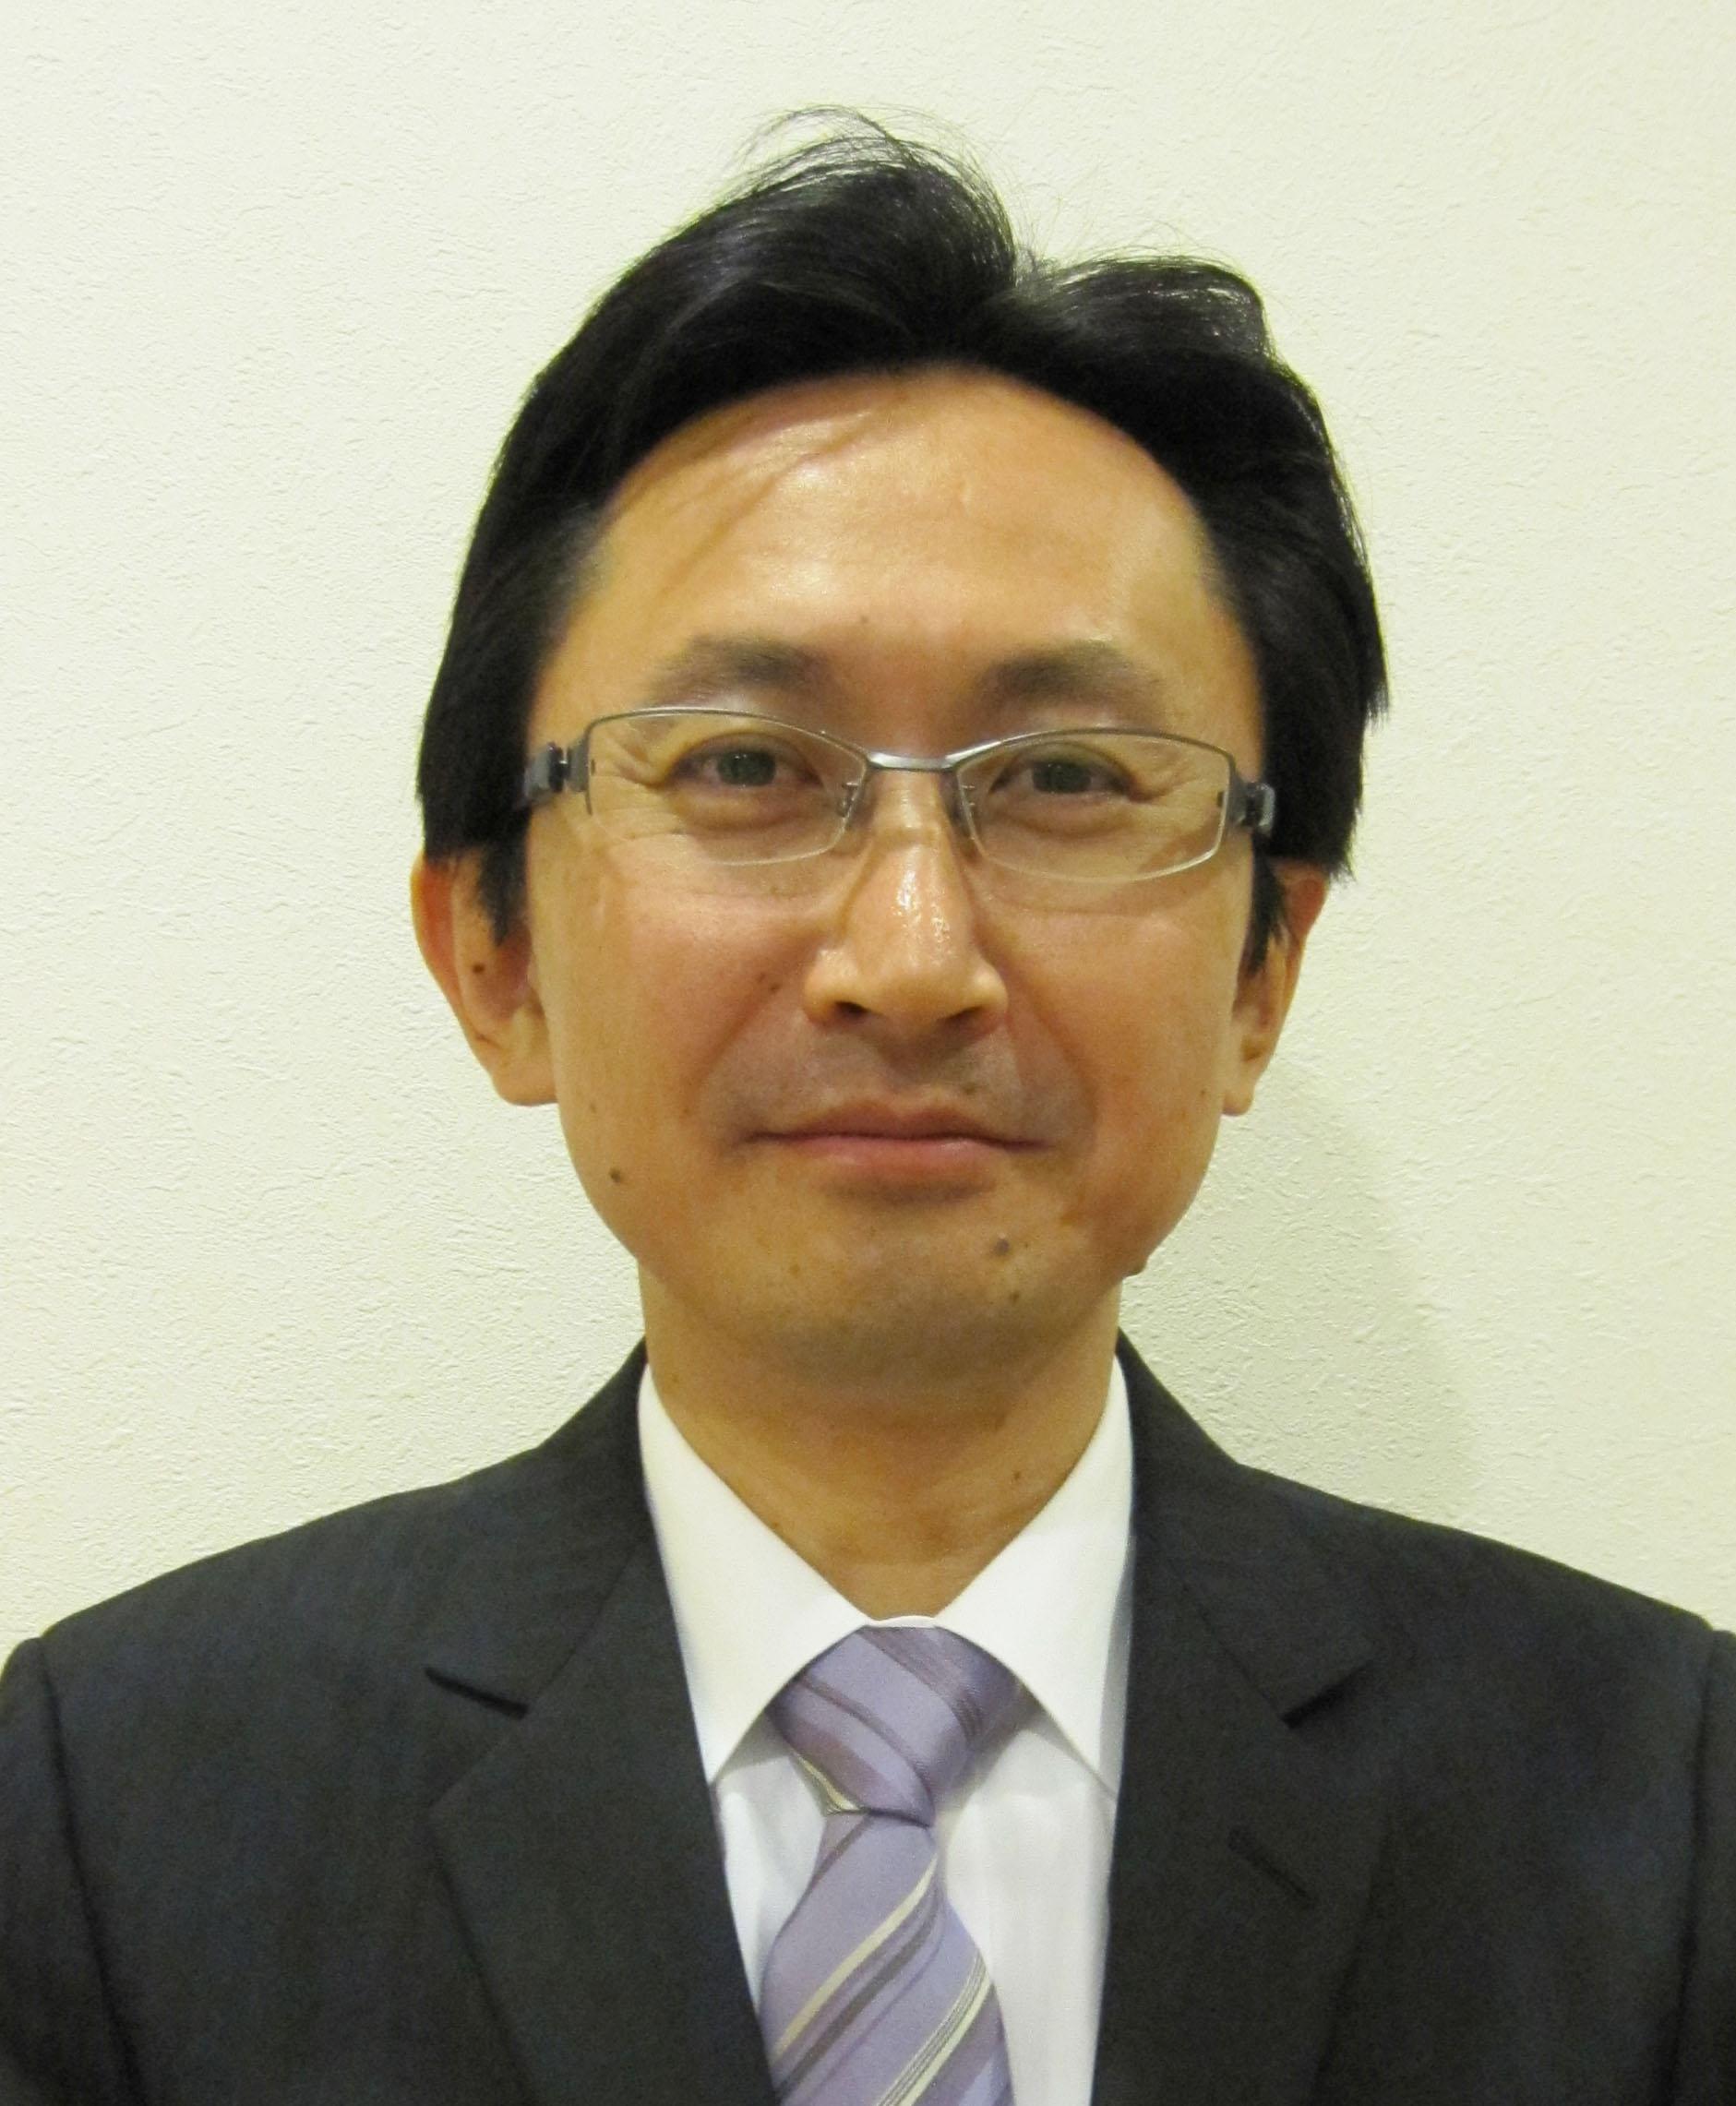 Hiroshi Kuroki